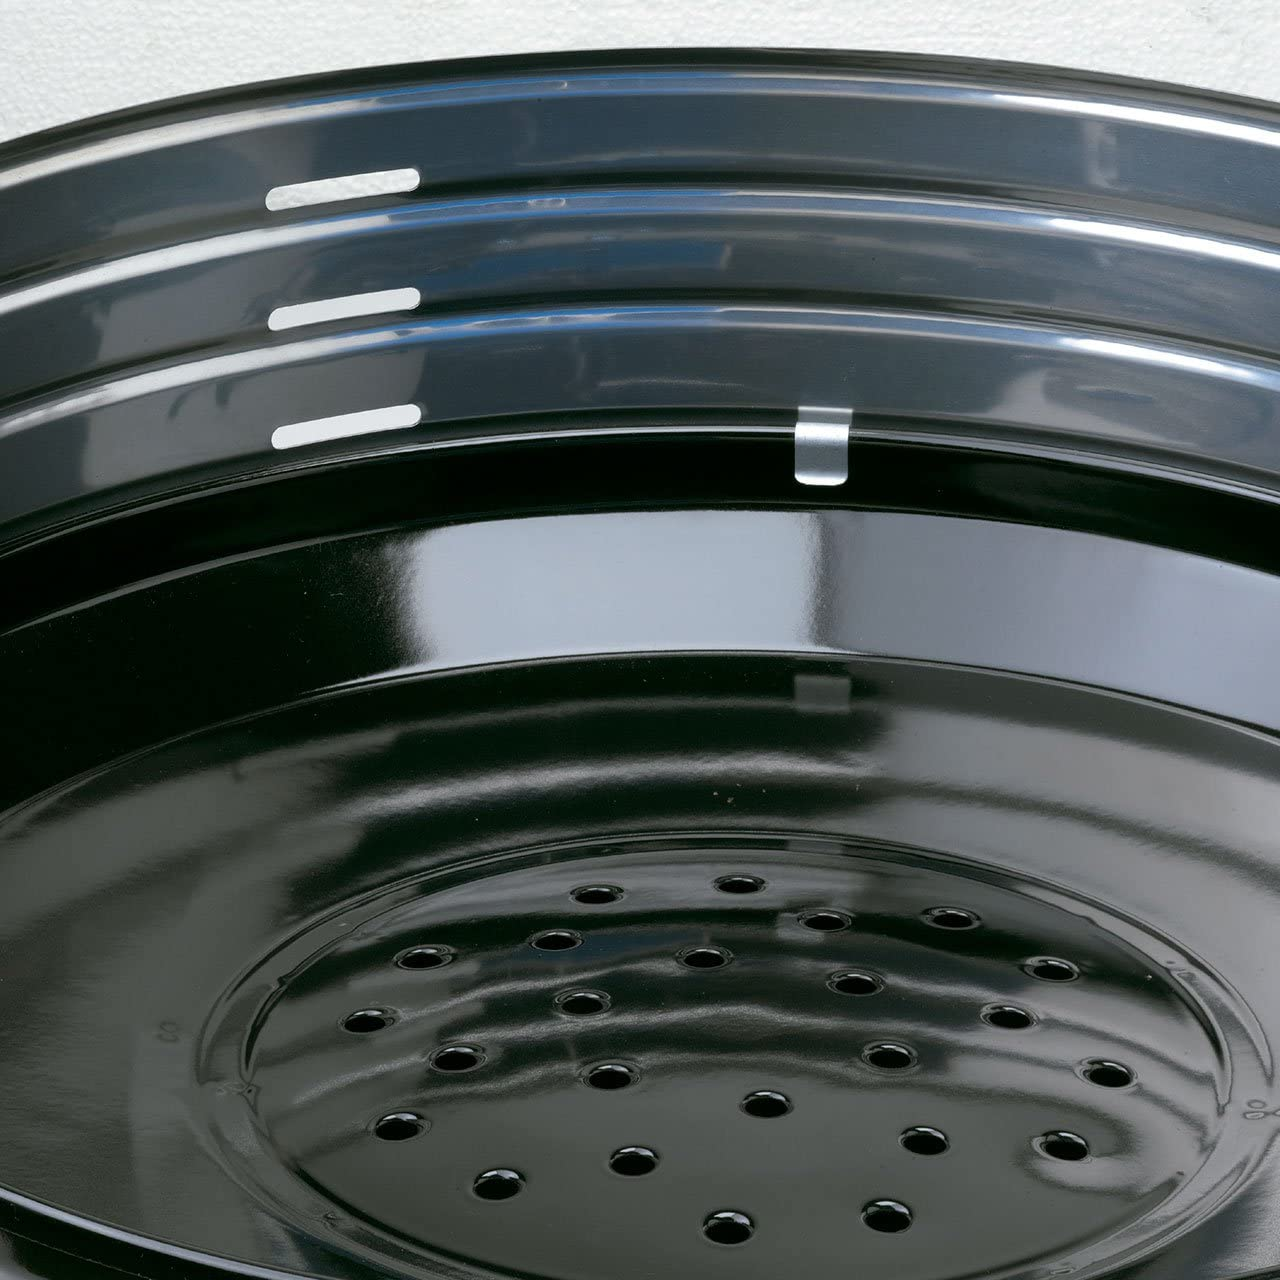 Color Negro 66 cm de Altura Algon AB02 Barbacoa Acero Inoxidable